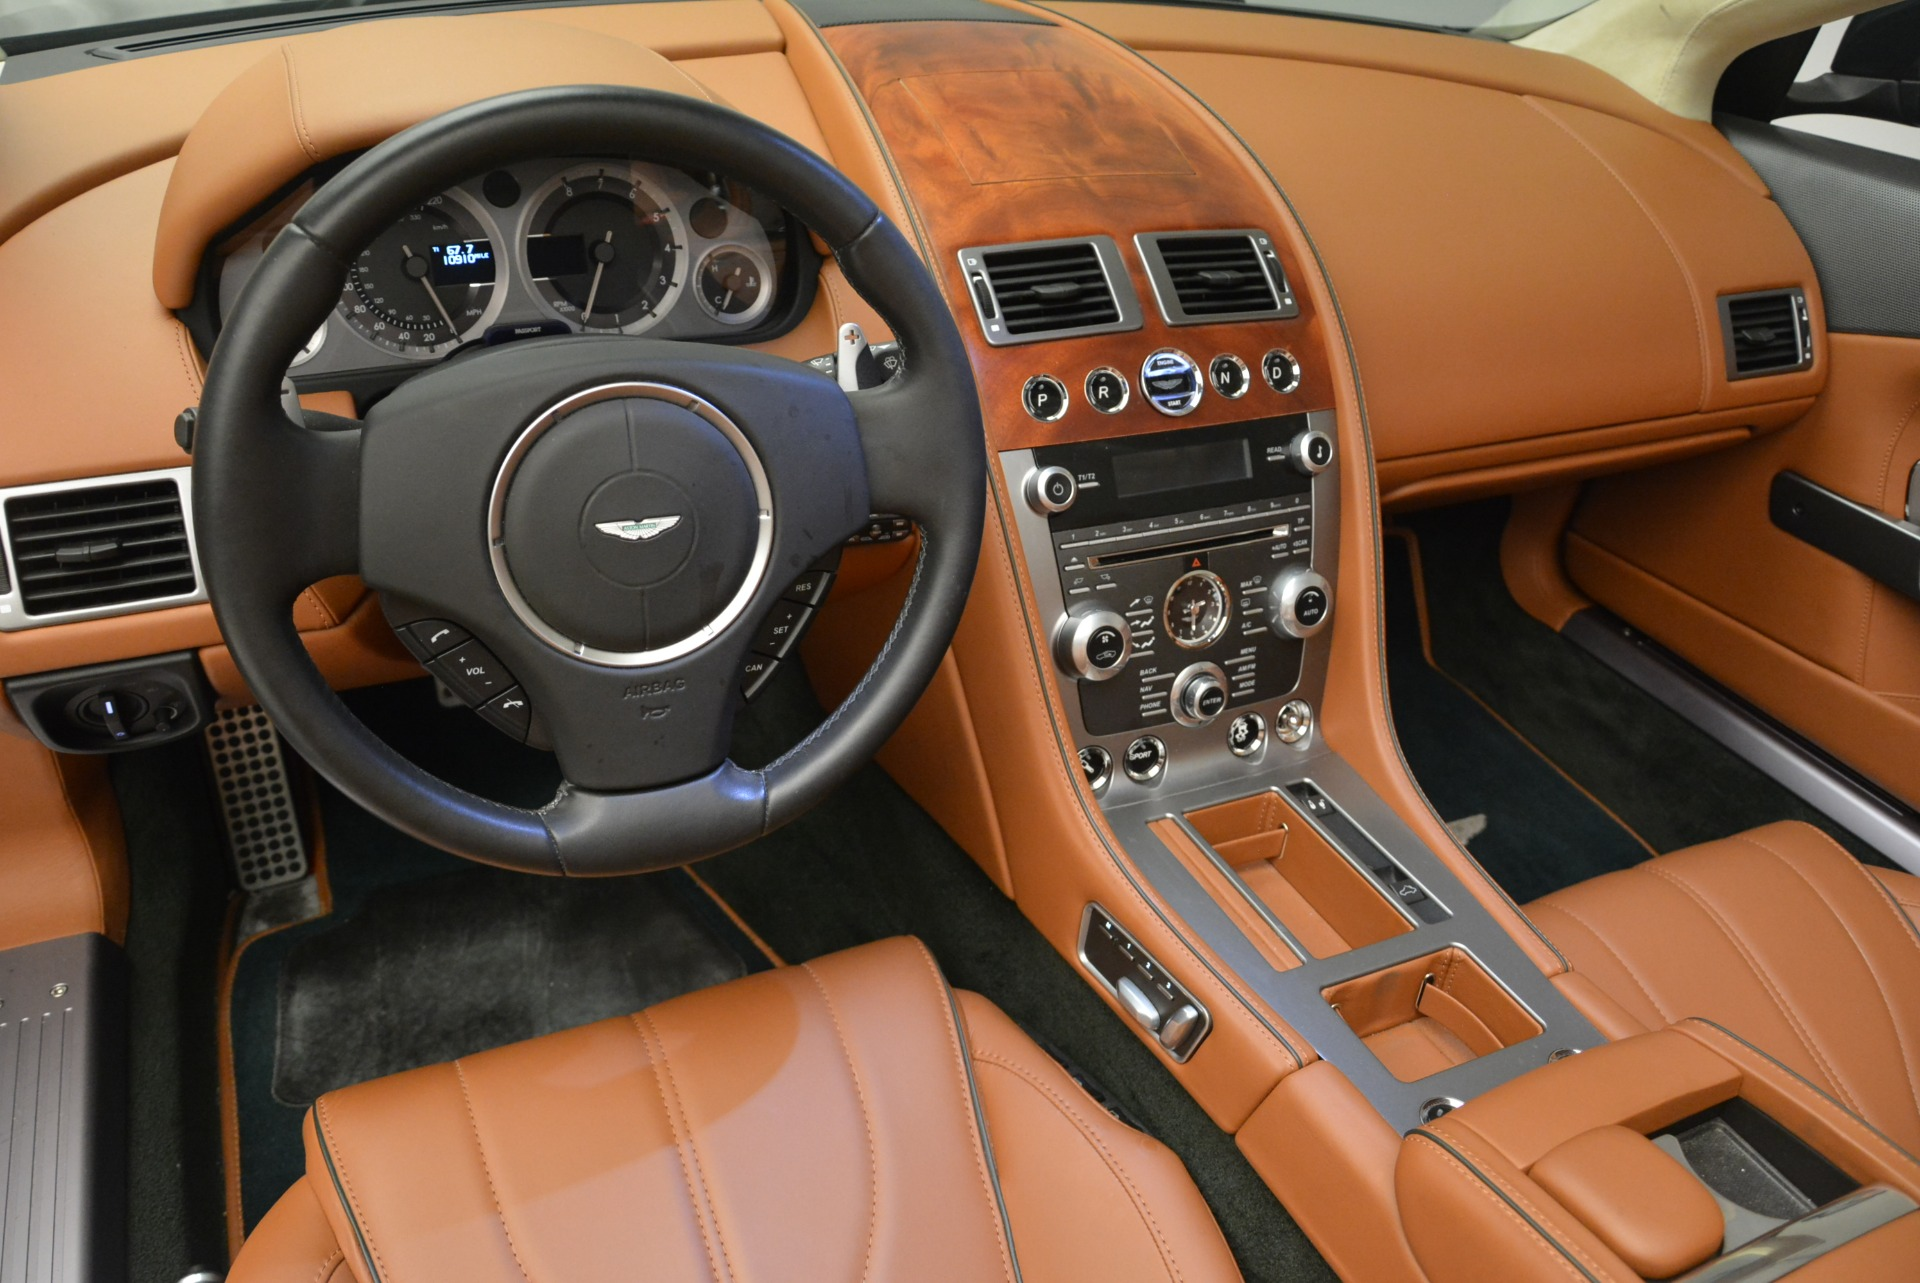 Used 2012 Aston Martin Virage Volante For Sale In Westport, CT 2508_p20